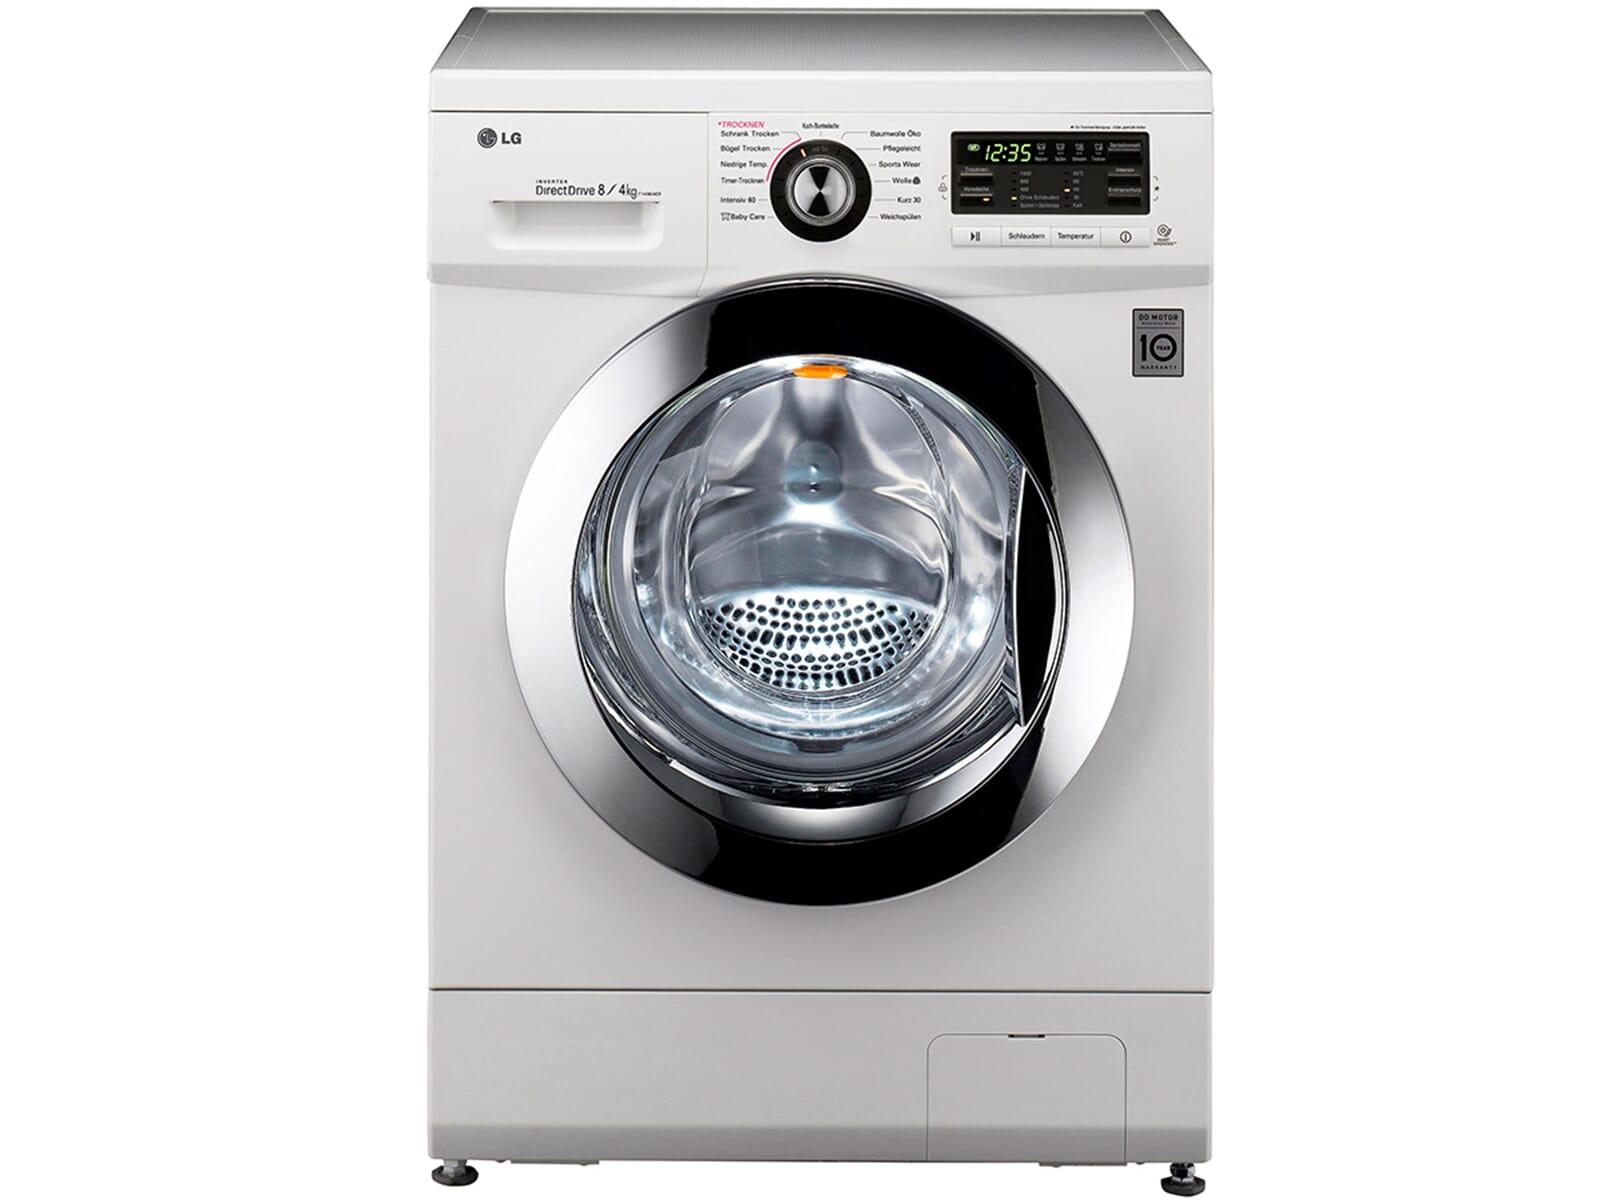 Lg f ad waschtrockner weiß